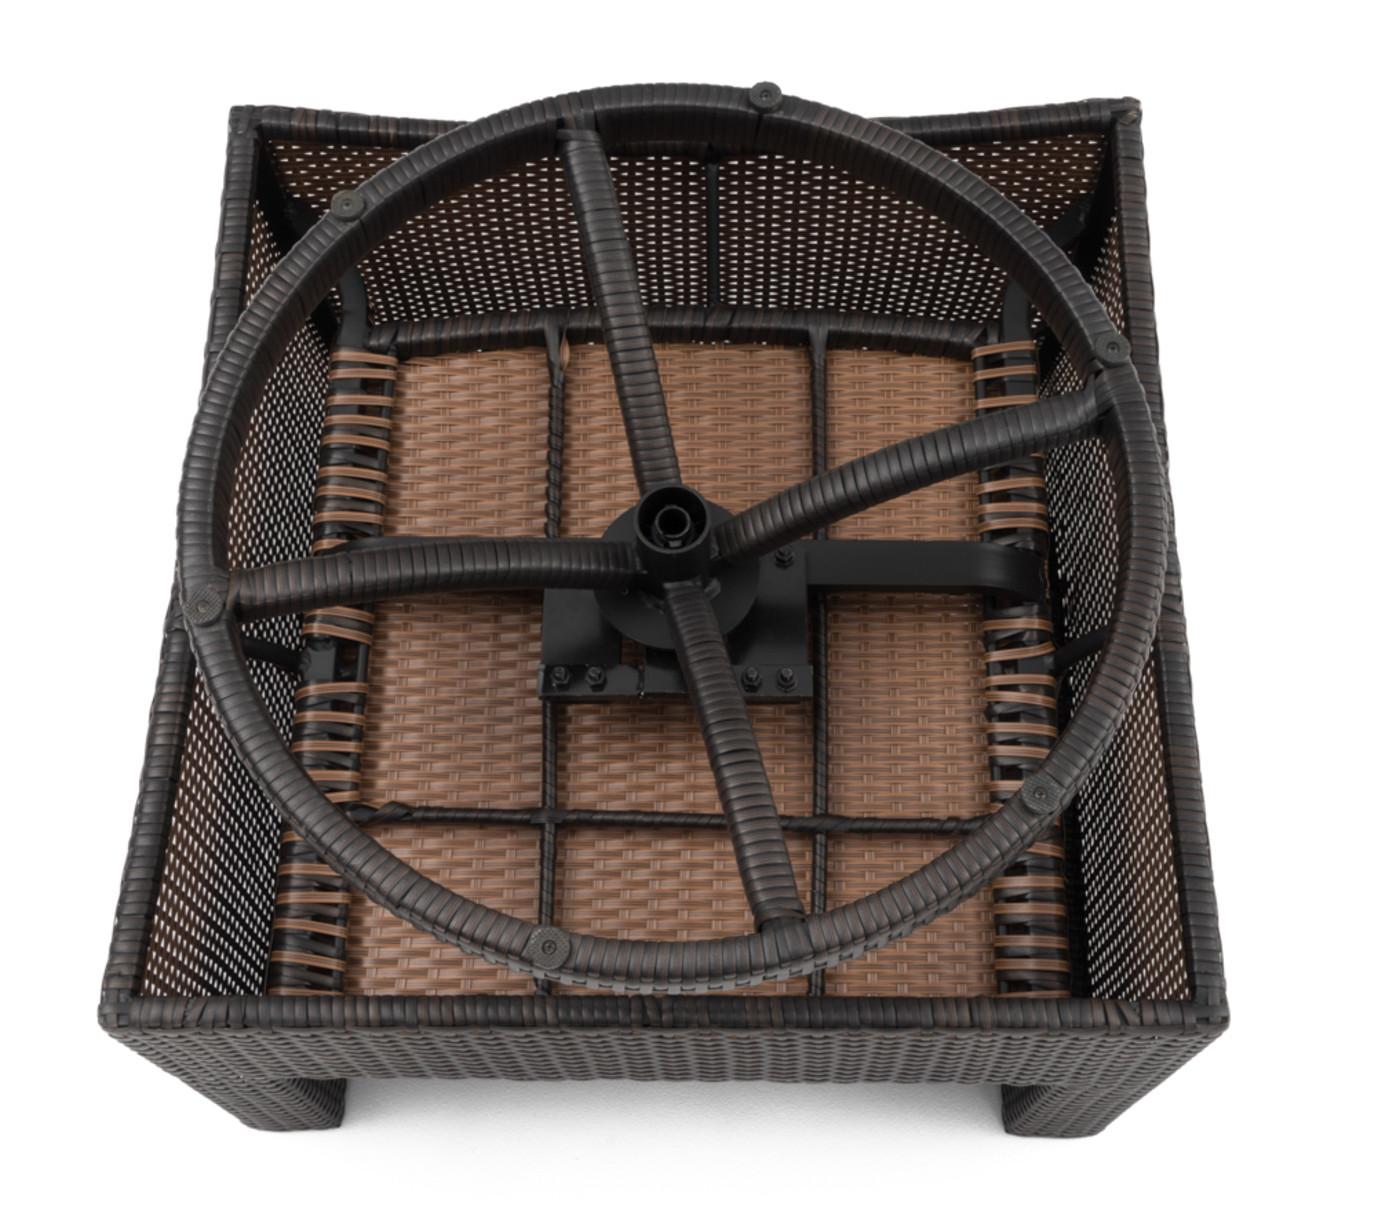 Deco™ Deluxe 5 Piece Motion Fire Chat Set - Wisteria Lavender